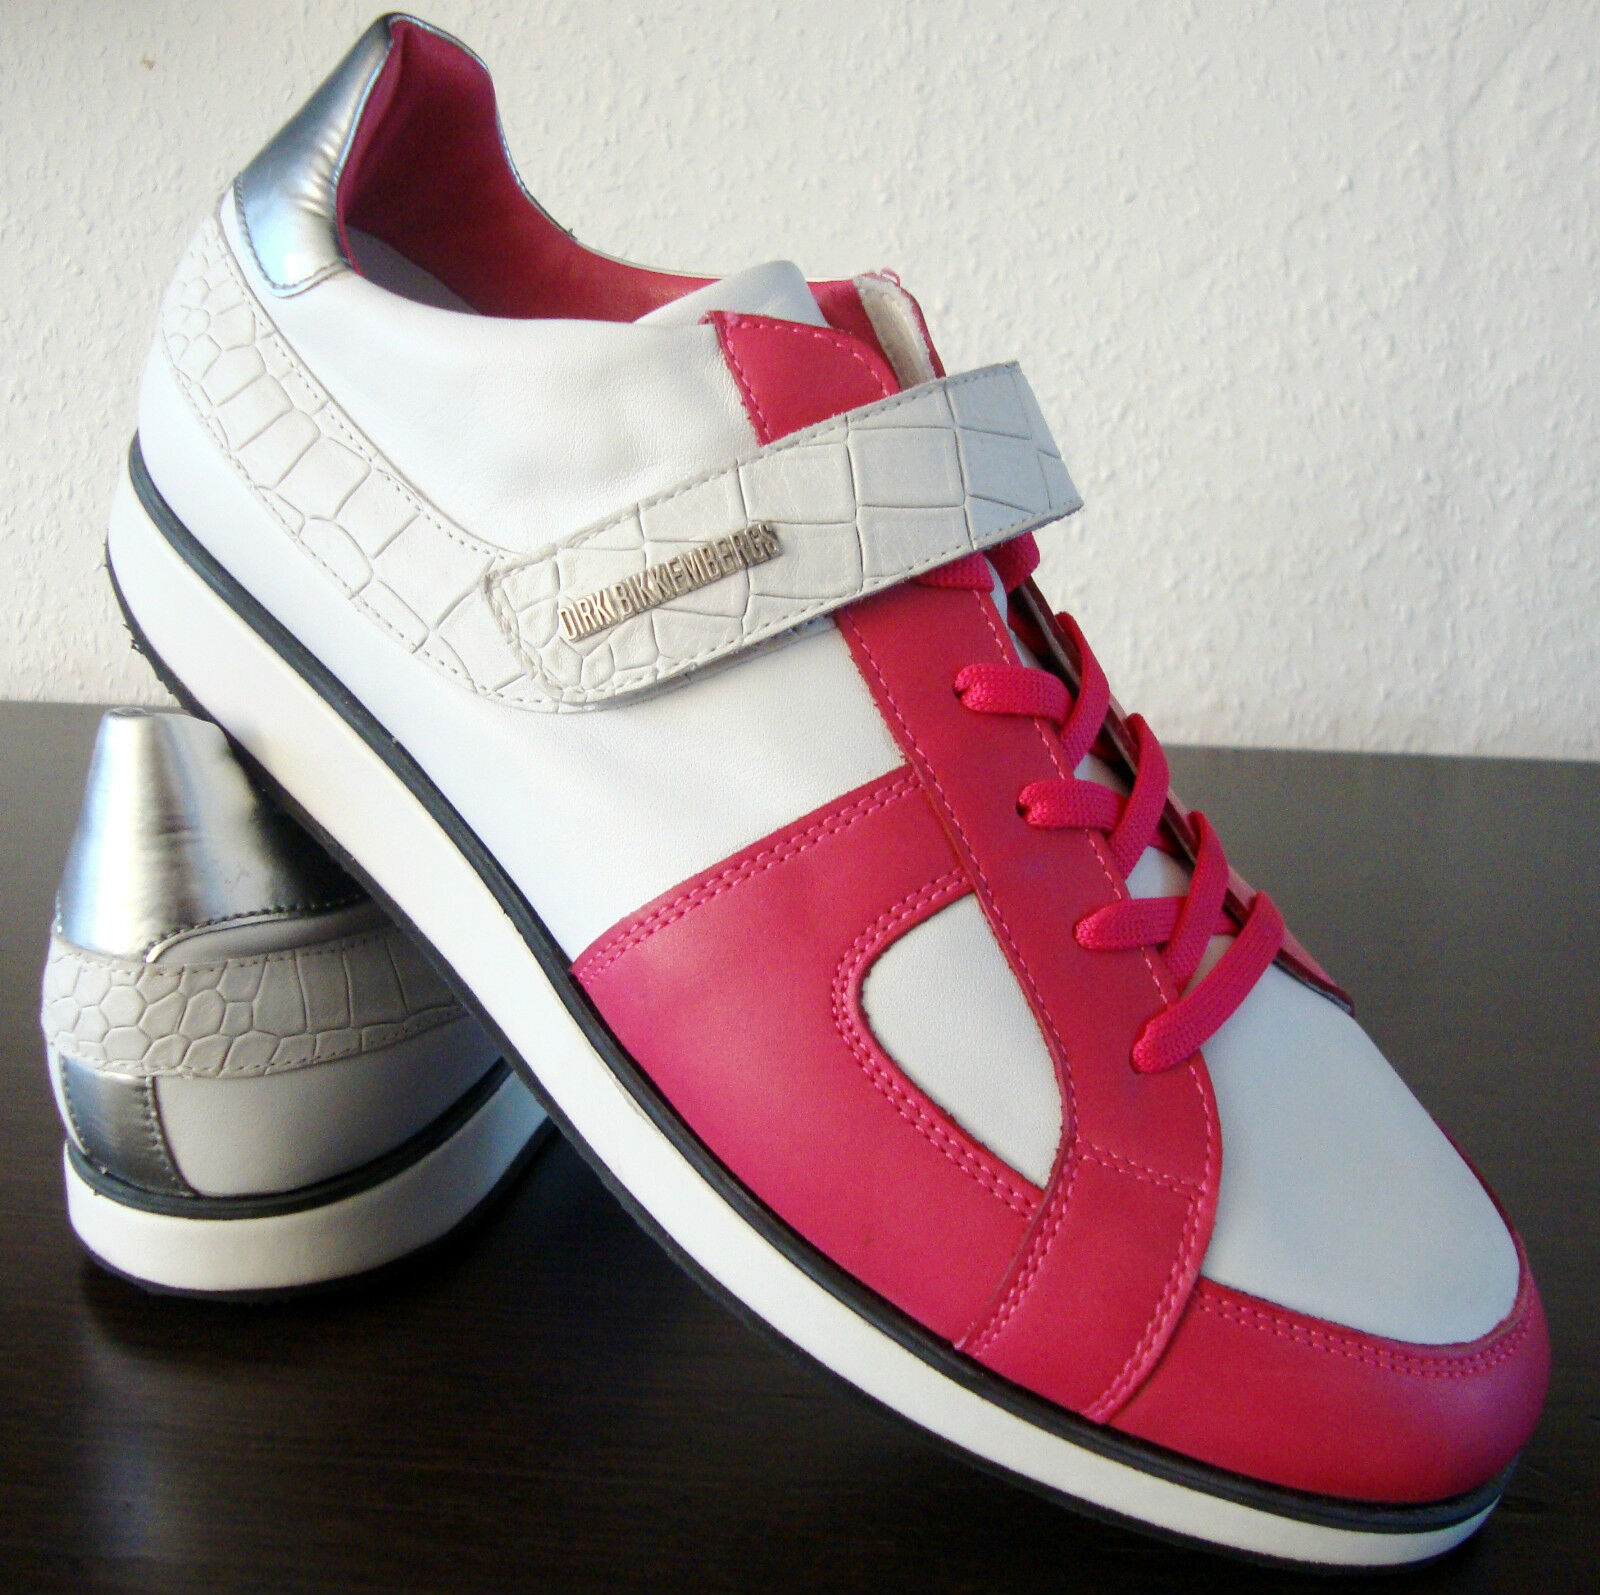 DIRK BIKKEMBERGS Sneakers FILLER DBR Leder 836 Shoes Herren Schuhe Leder DBR Gr.42 NEU ced79c